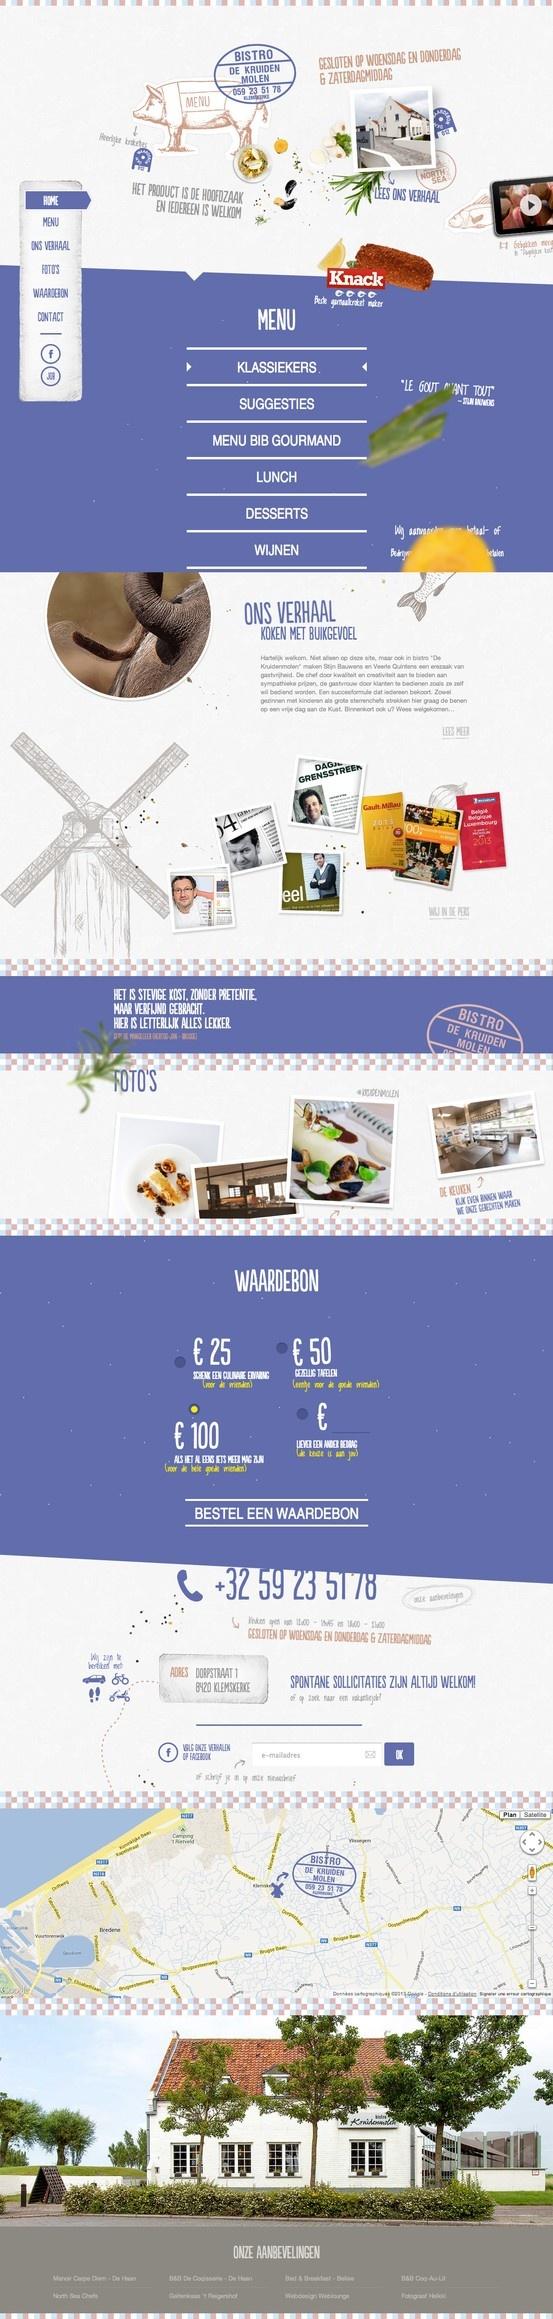 bistro #webdesign | #webdesign #it #web #design #layout #userinterface #website #webdesign < repinned by www.BlickeDeeler.de | Take a look at www.WebsiteDesign-Hamburg.de